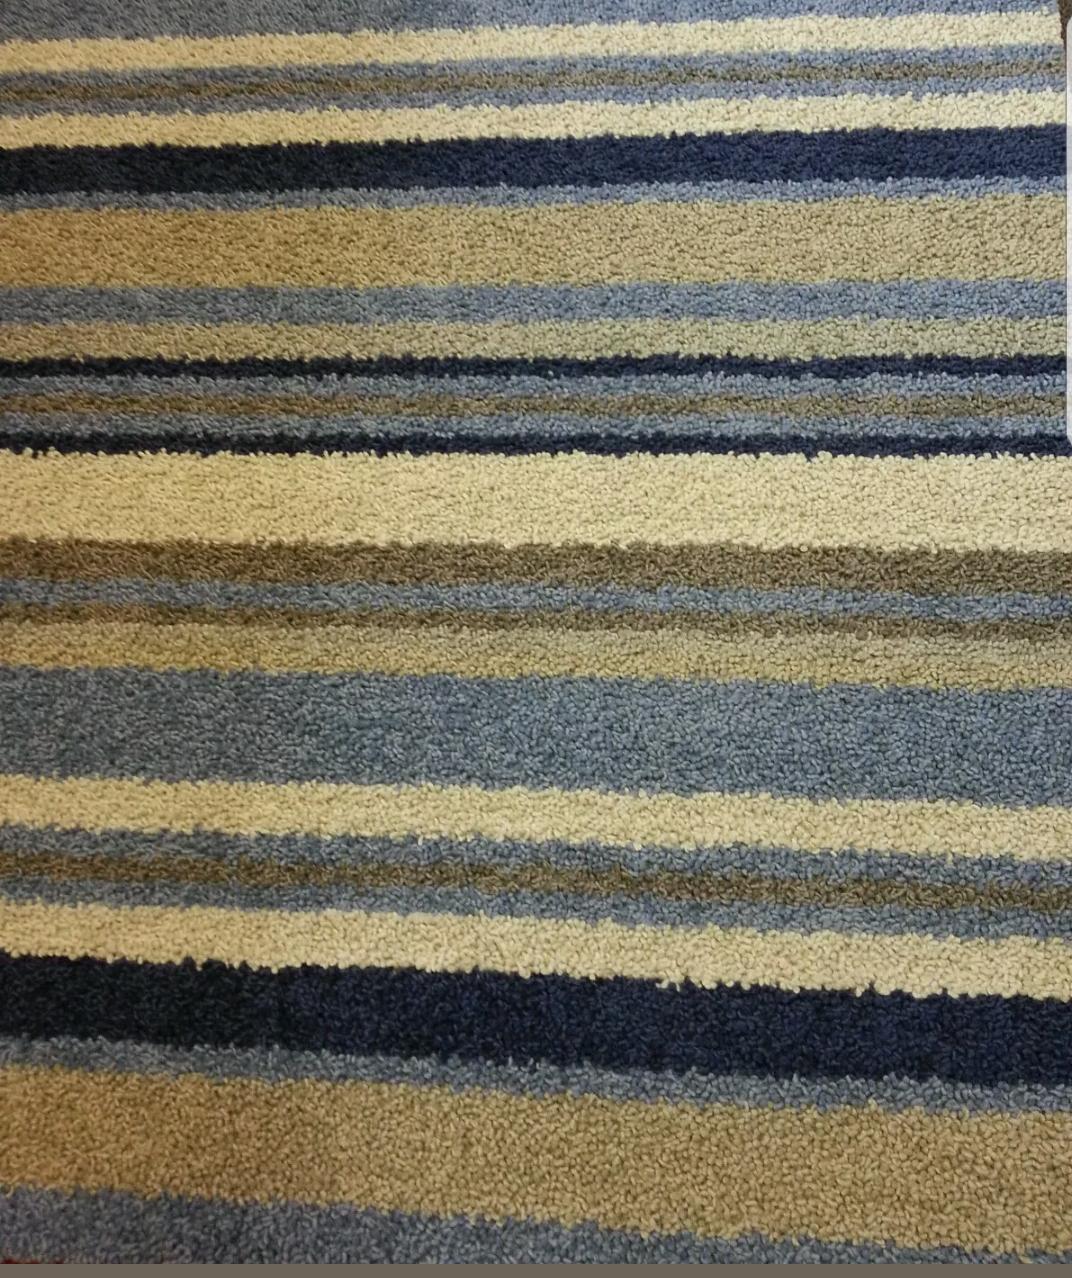 Bild: Teppich Spotline